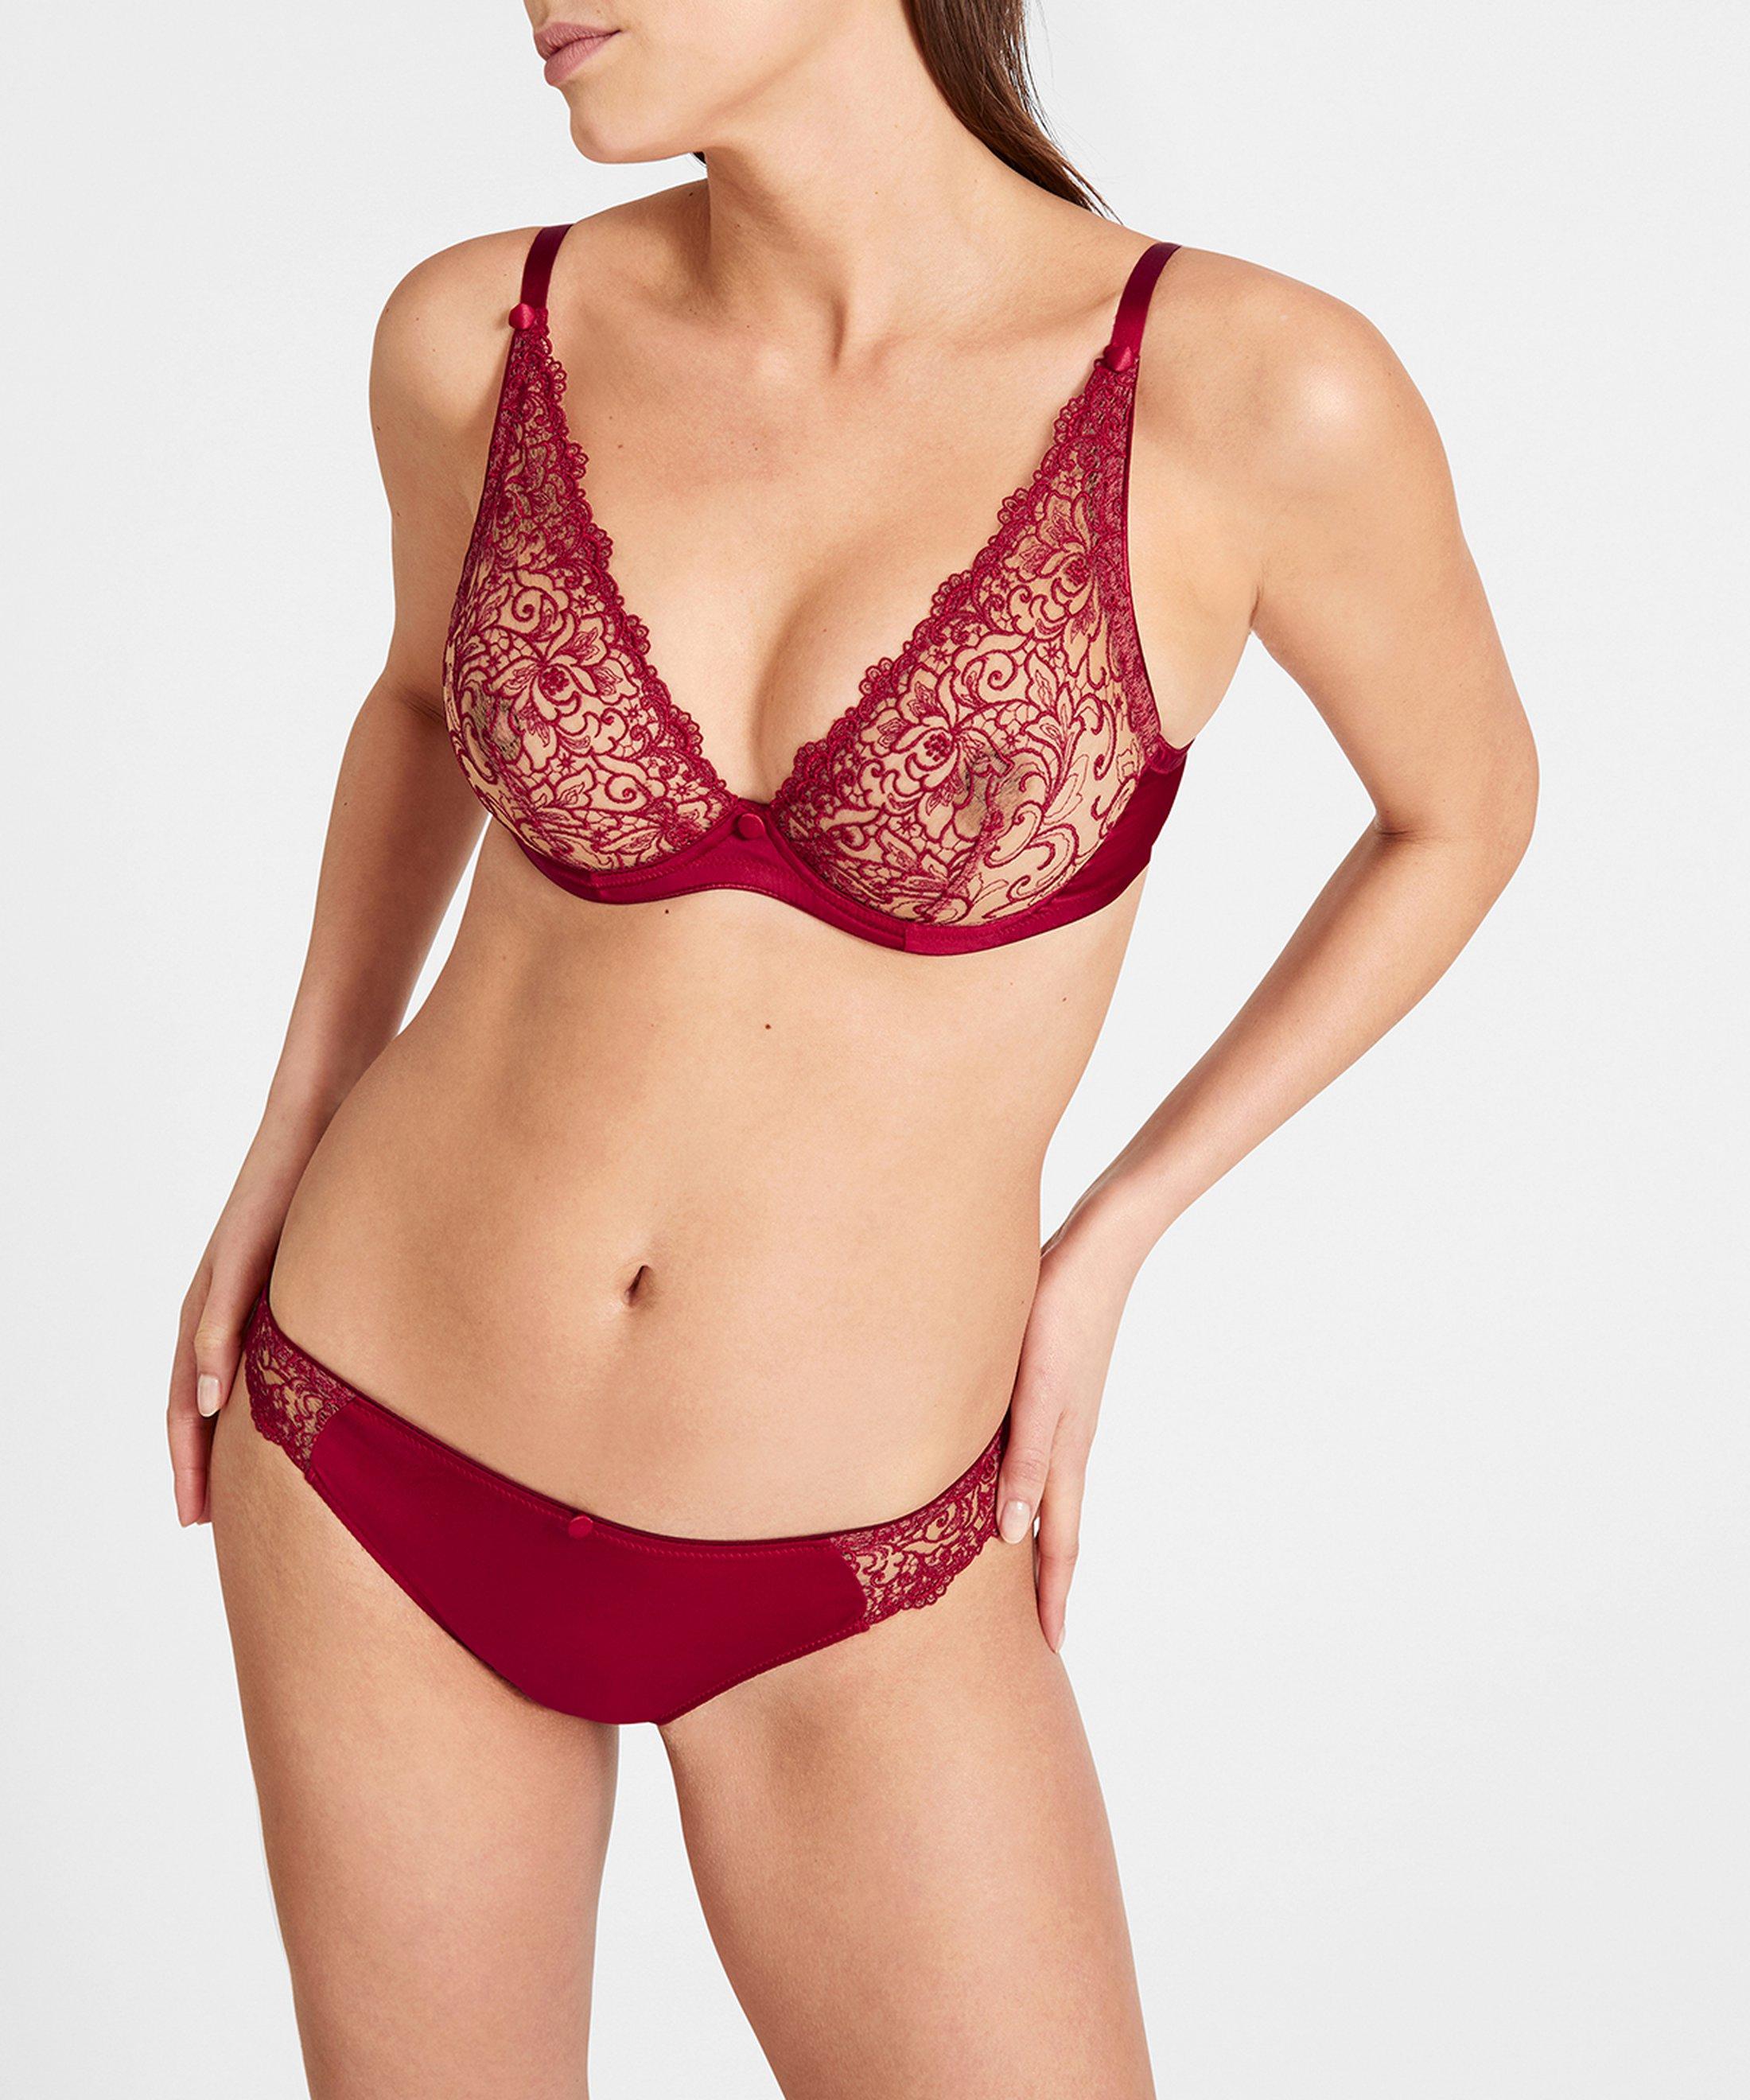 KARL LAGERFELD X AUBADE Culotte Italienne Rouge Rubis  | Aubade